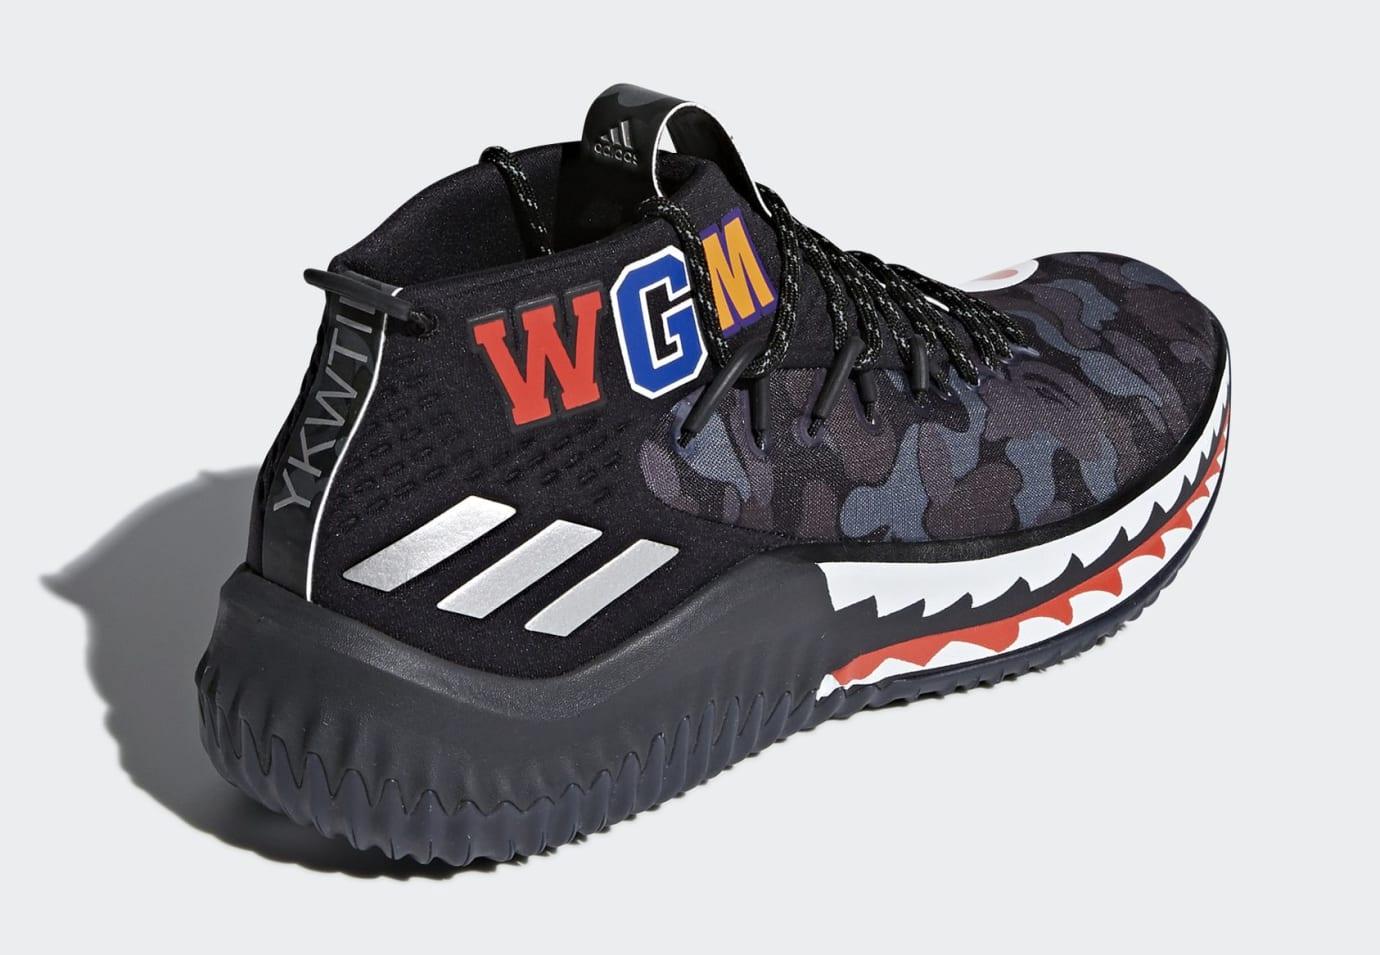 BAPE x Adidas Dame 4 'Black Camo' AP9975 (Heel)